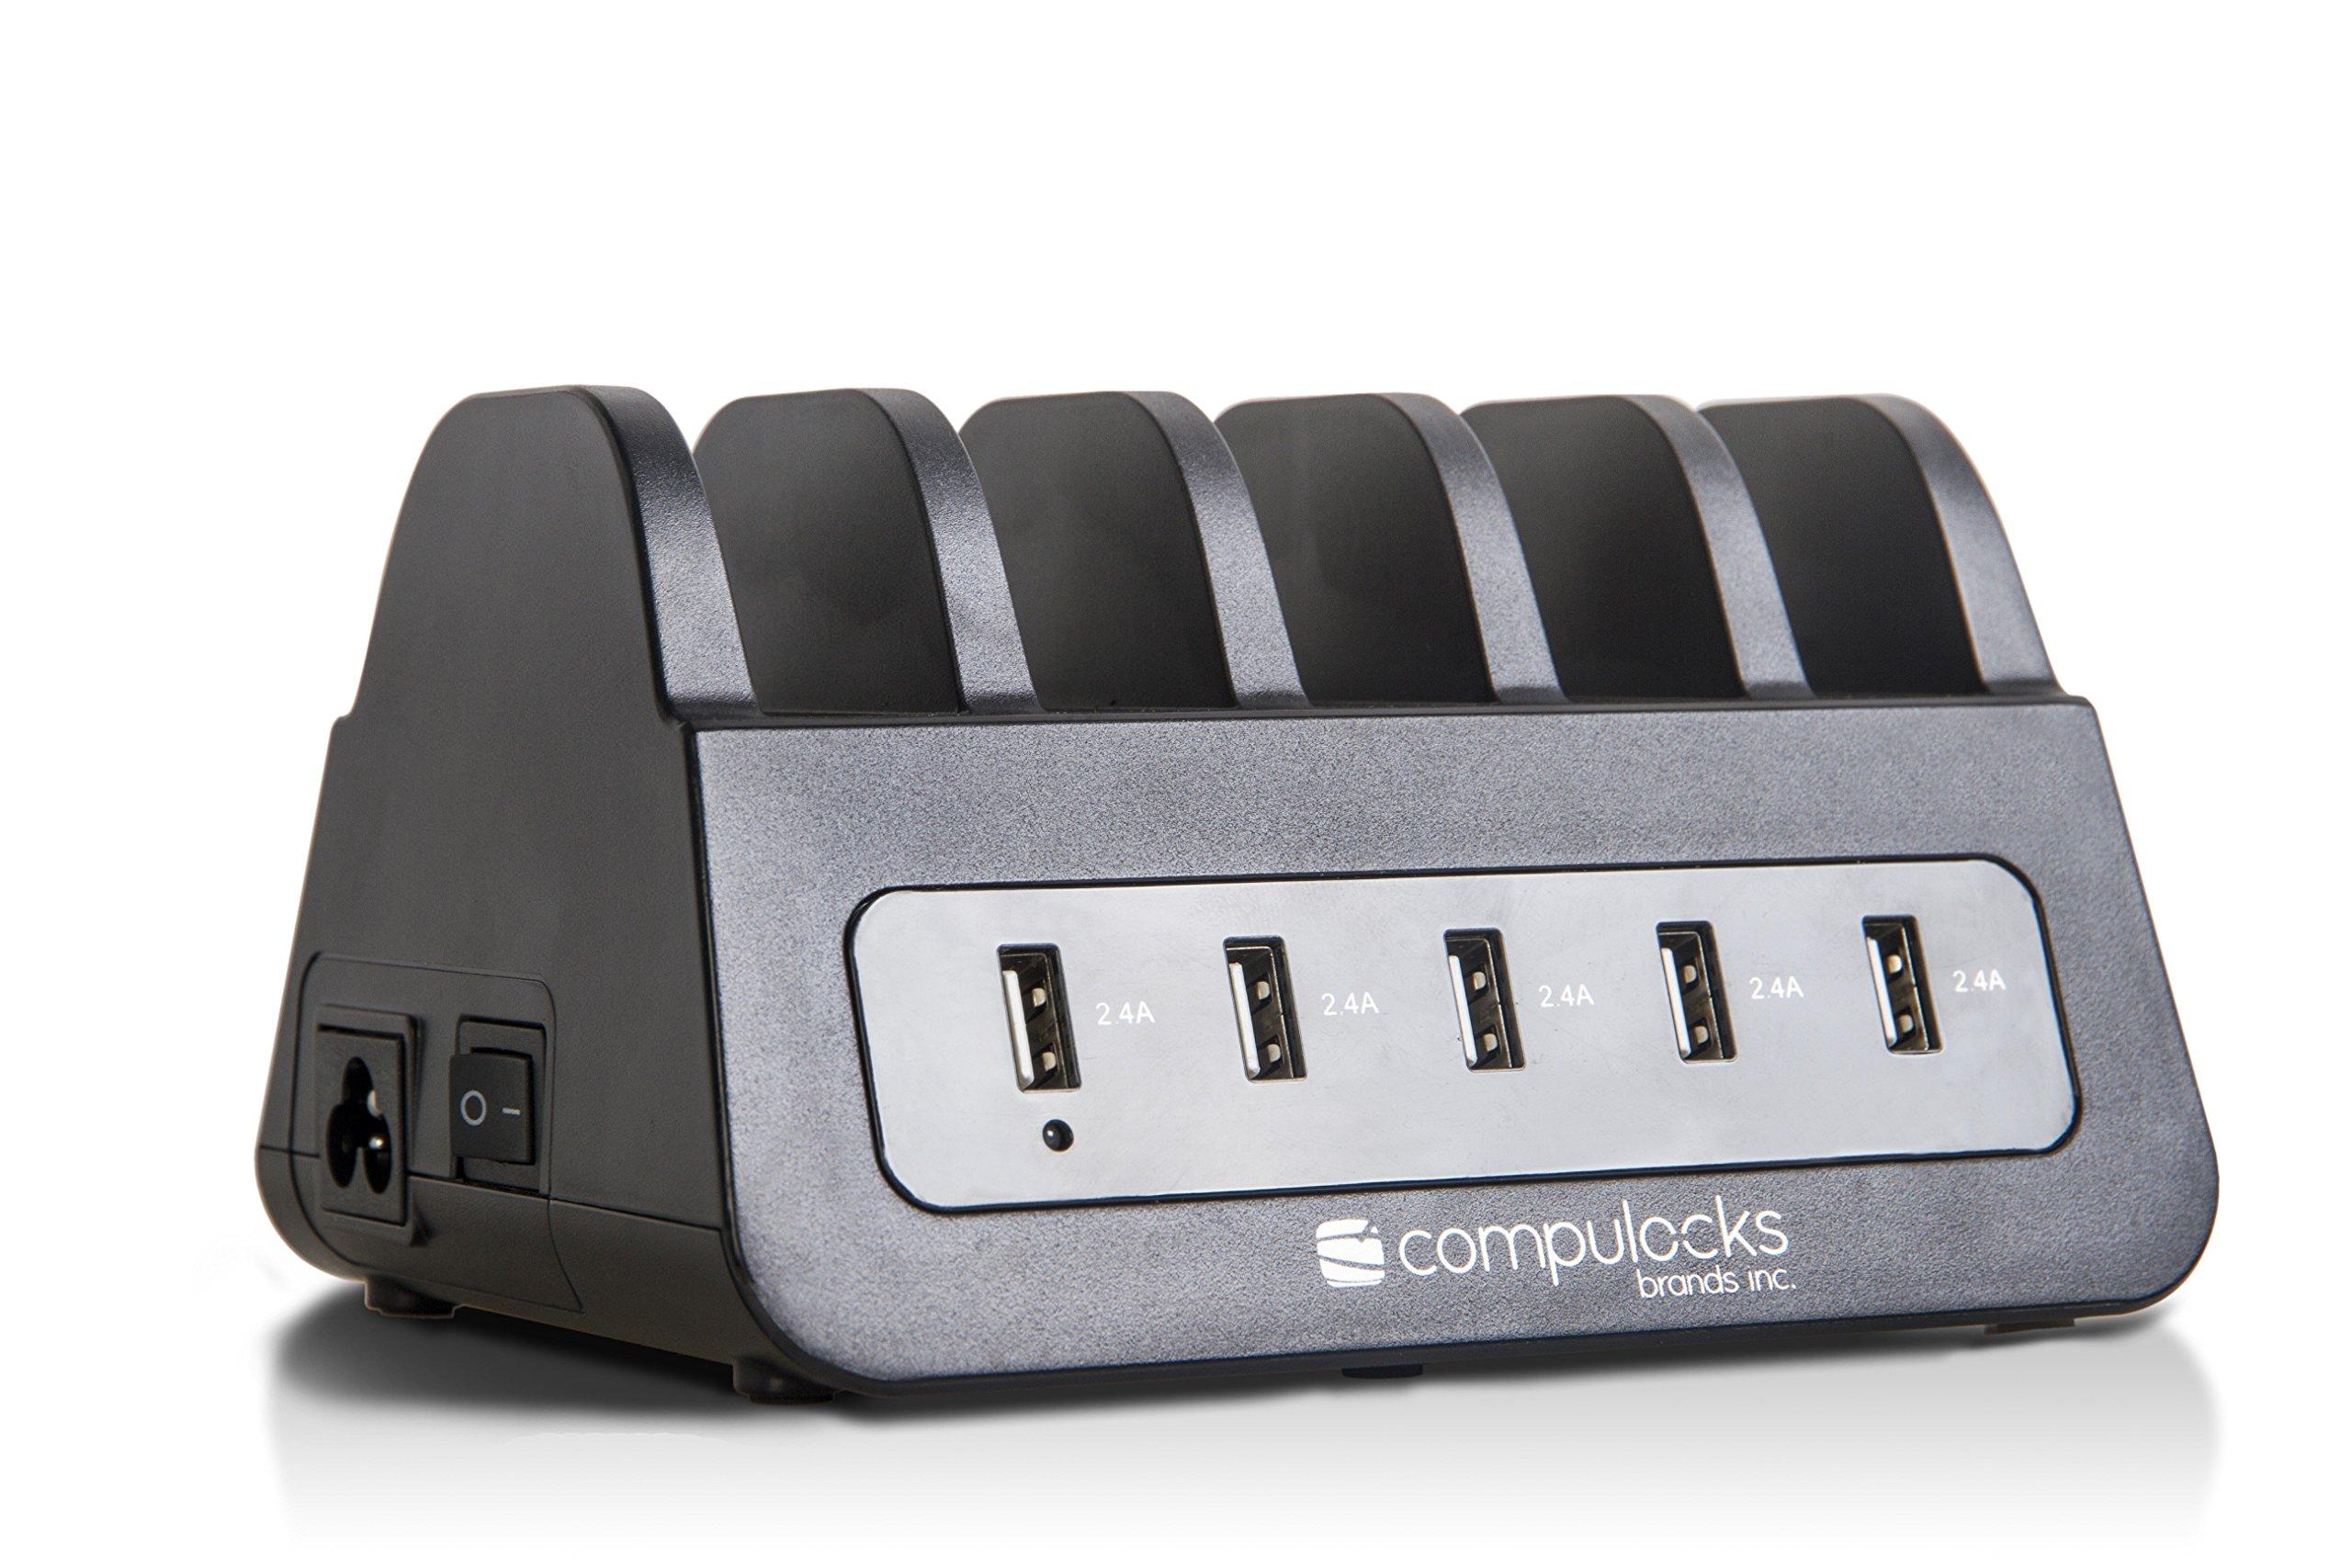 Maclocks 5PUSBDKS 5 Port USB Charging Dock Station for Smart Phone iPhone/iPad/Samsung/Nexus